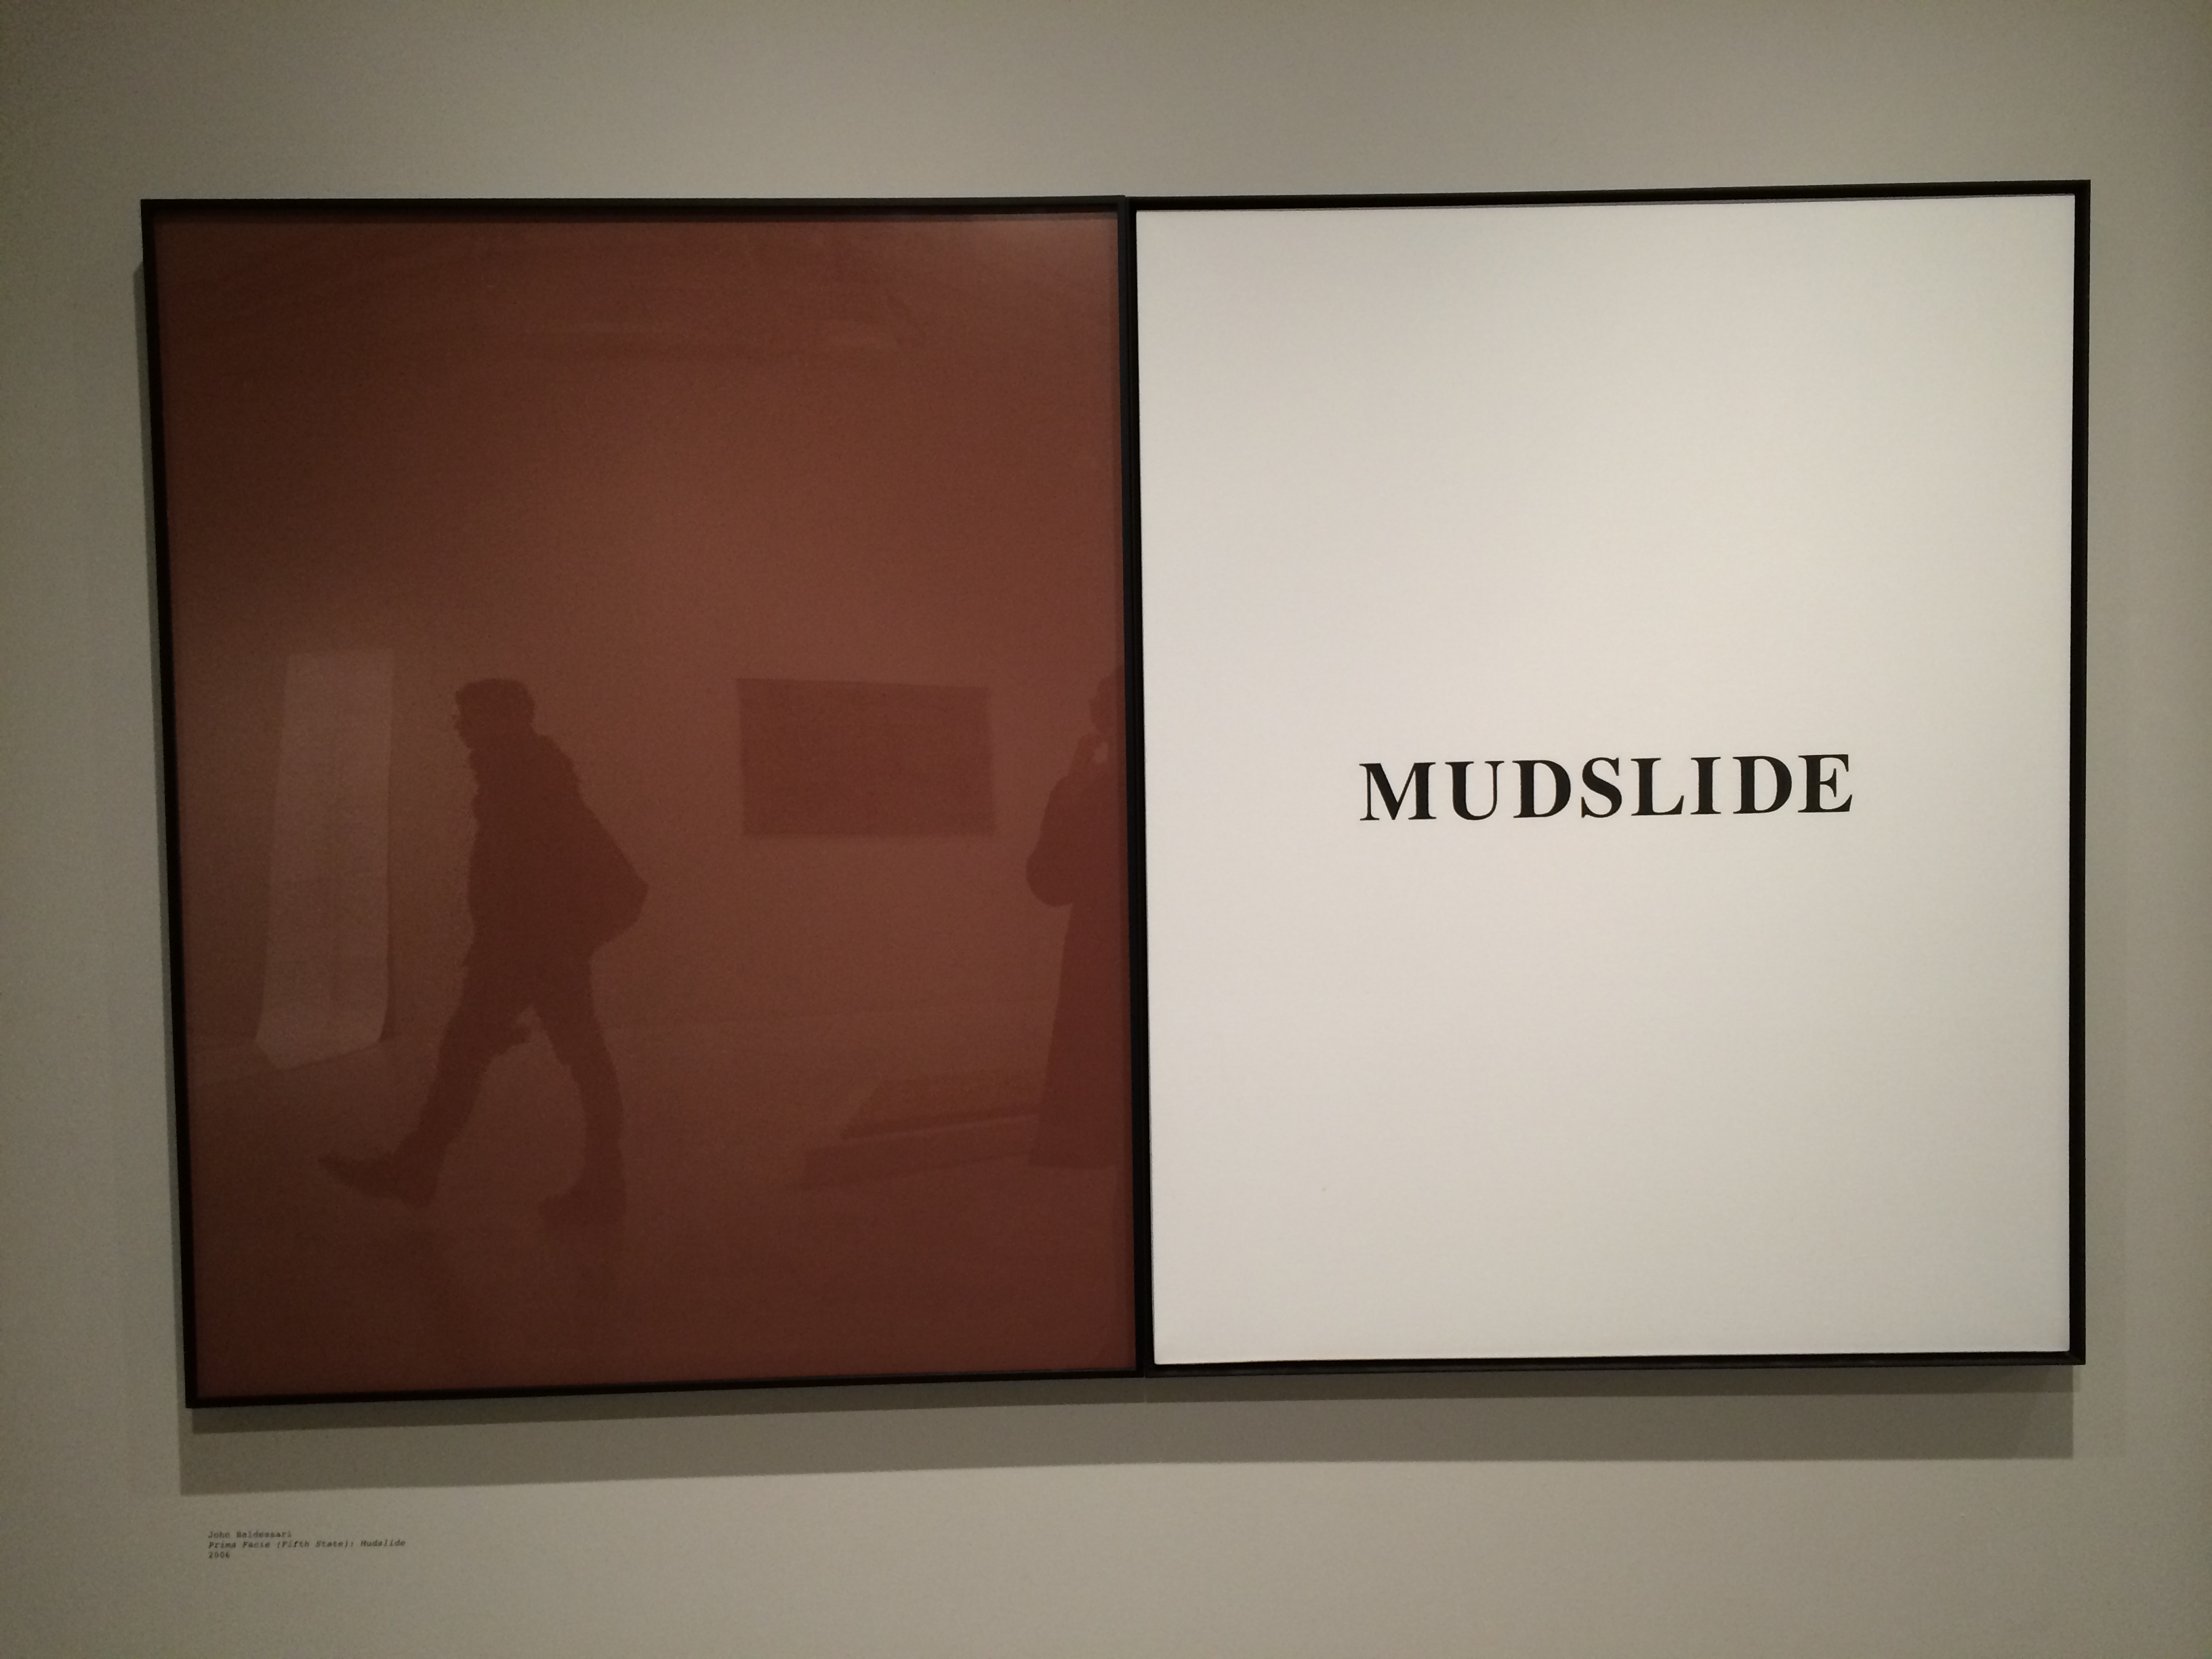 John Baldessari, Prima Facie: Mudslide, 2006